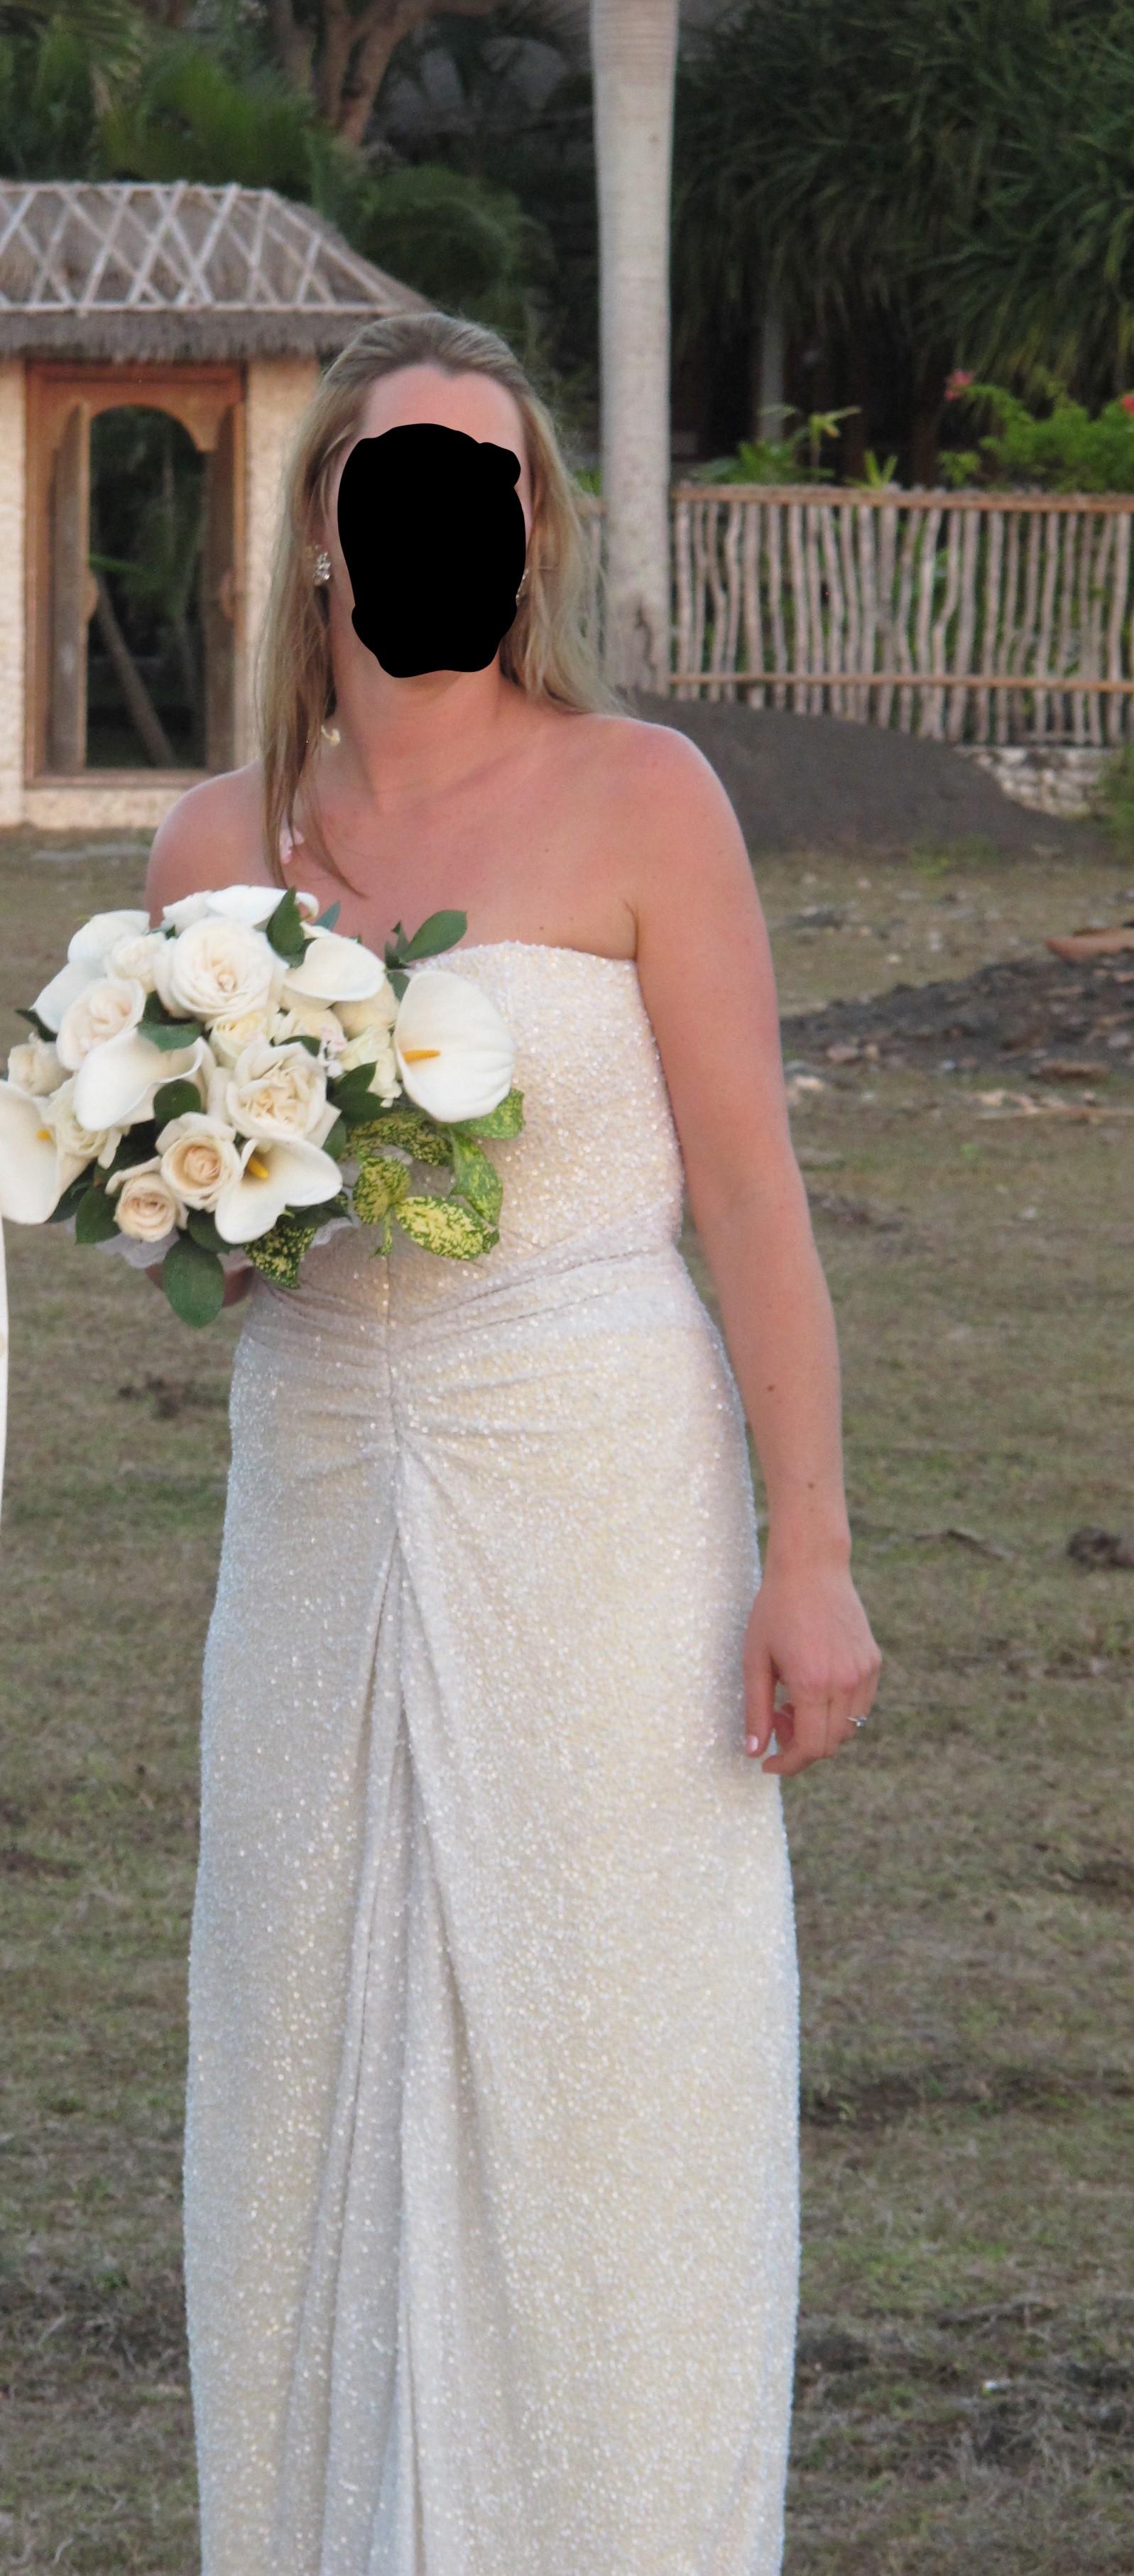 Michael Kors Sweetheart Strapless Preloved Wedding Dress Save 74 Stillwhite,Bride Plus Size Black Wedding Dresses